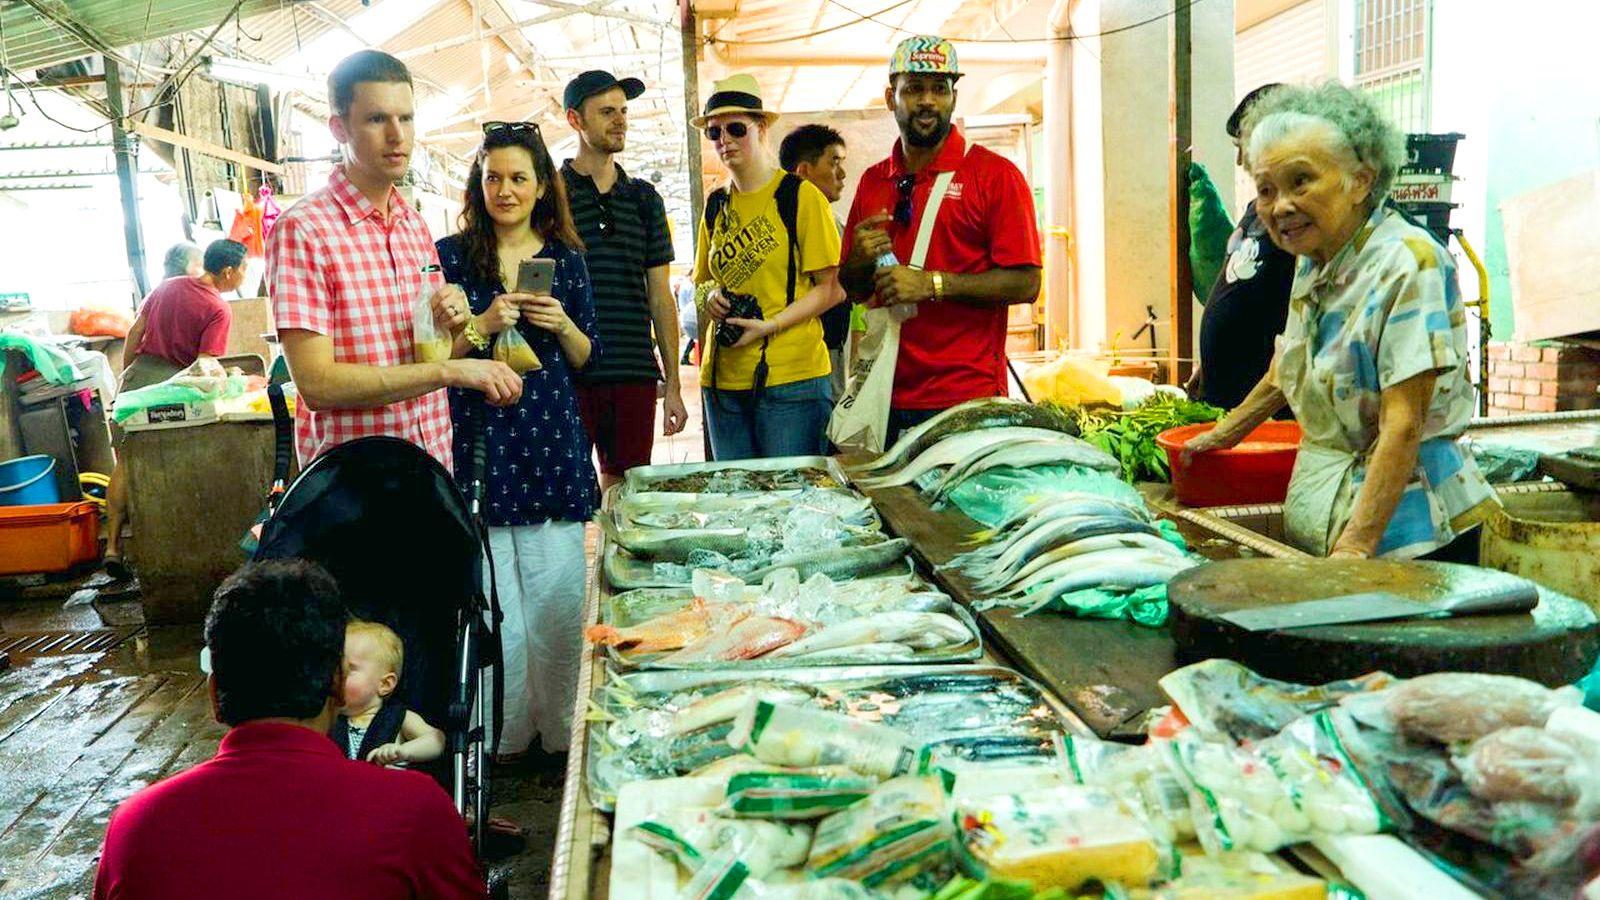 Culinaire tour door Kuala Lumpur in kleine groep